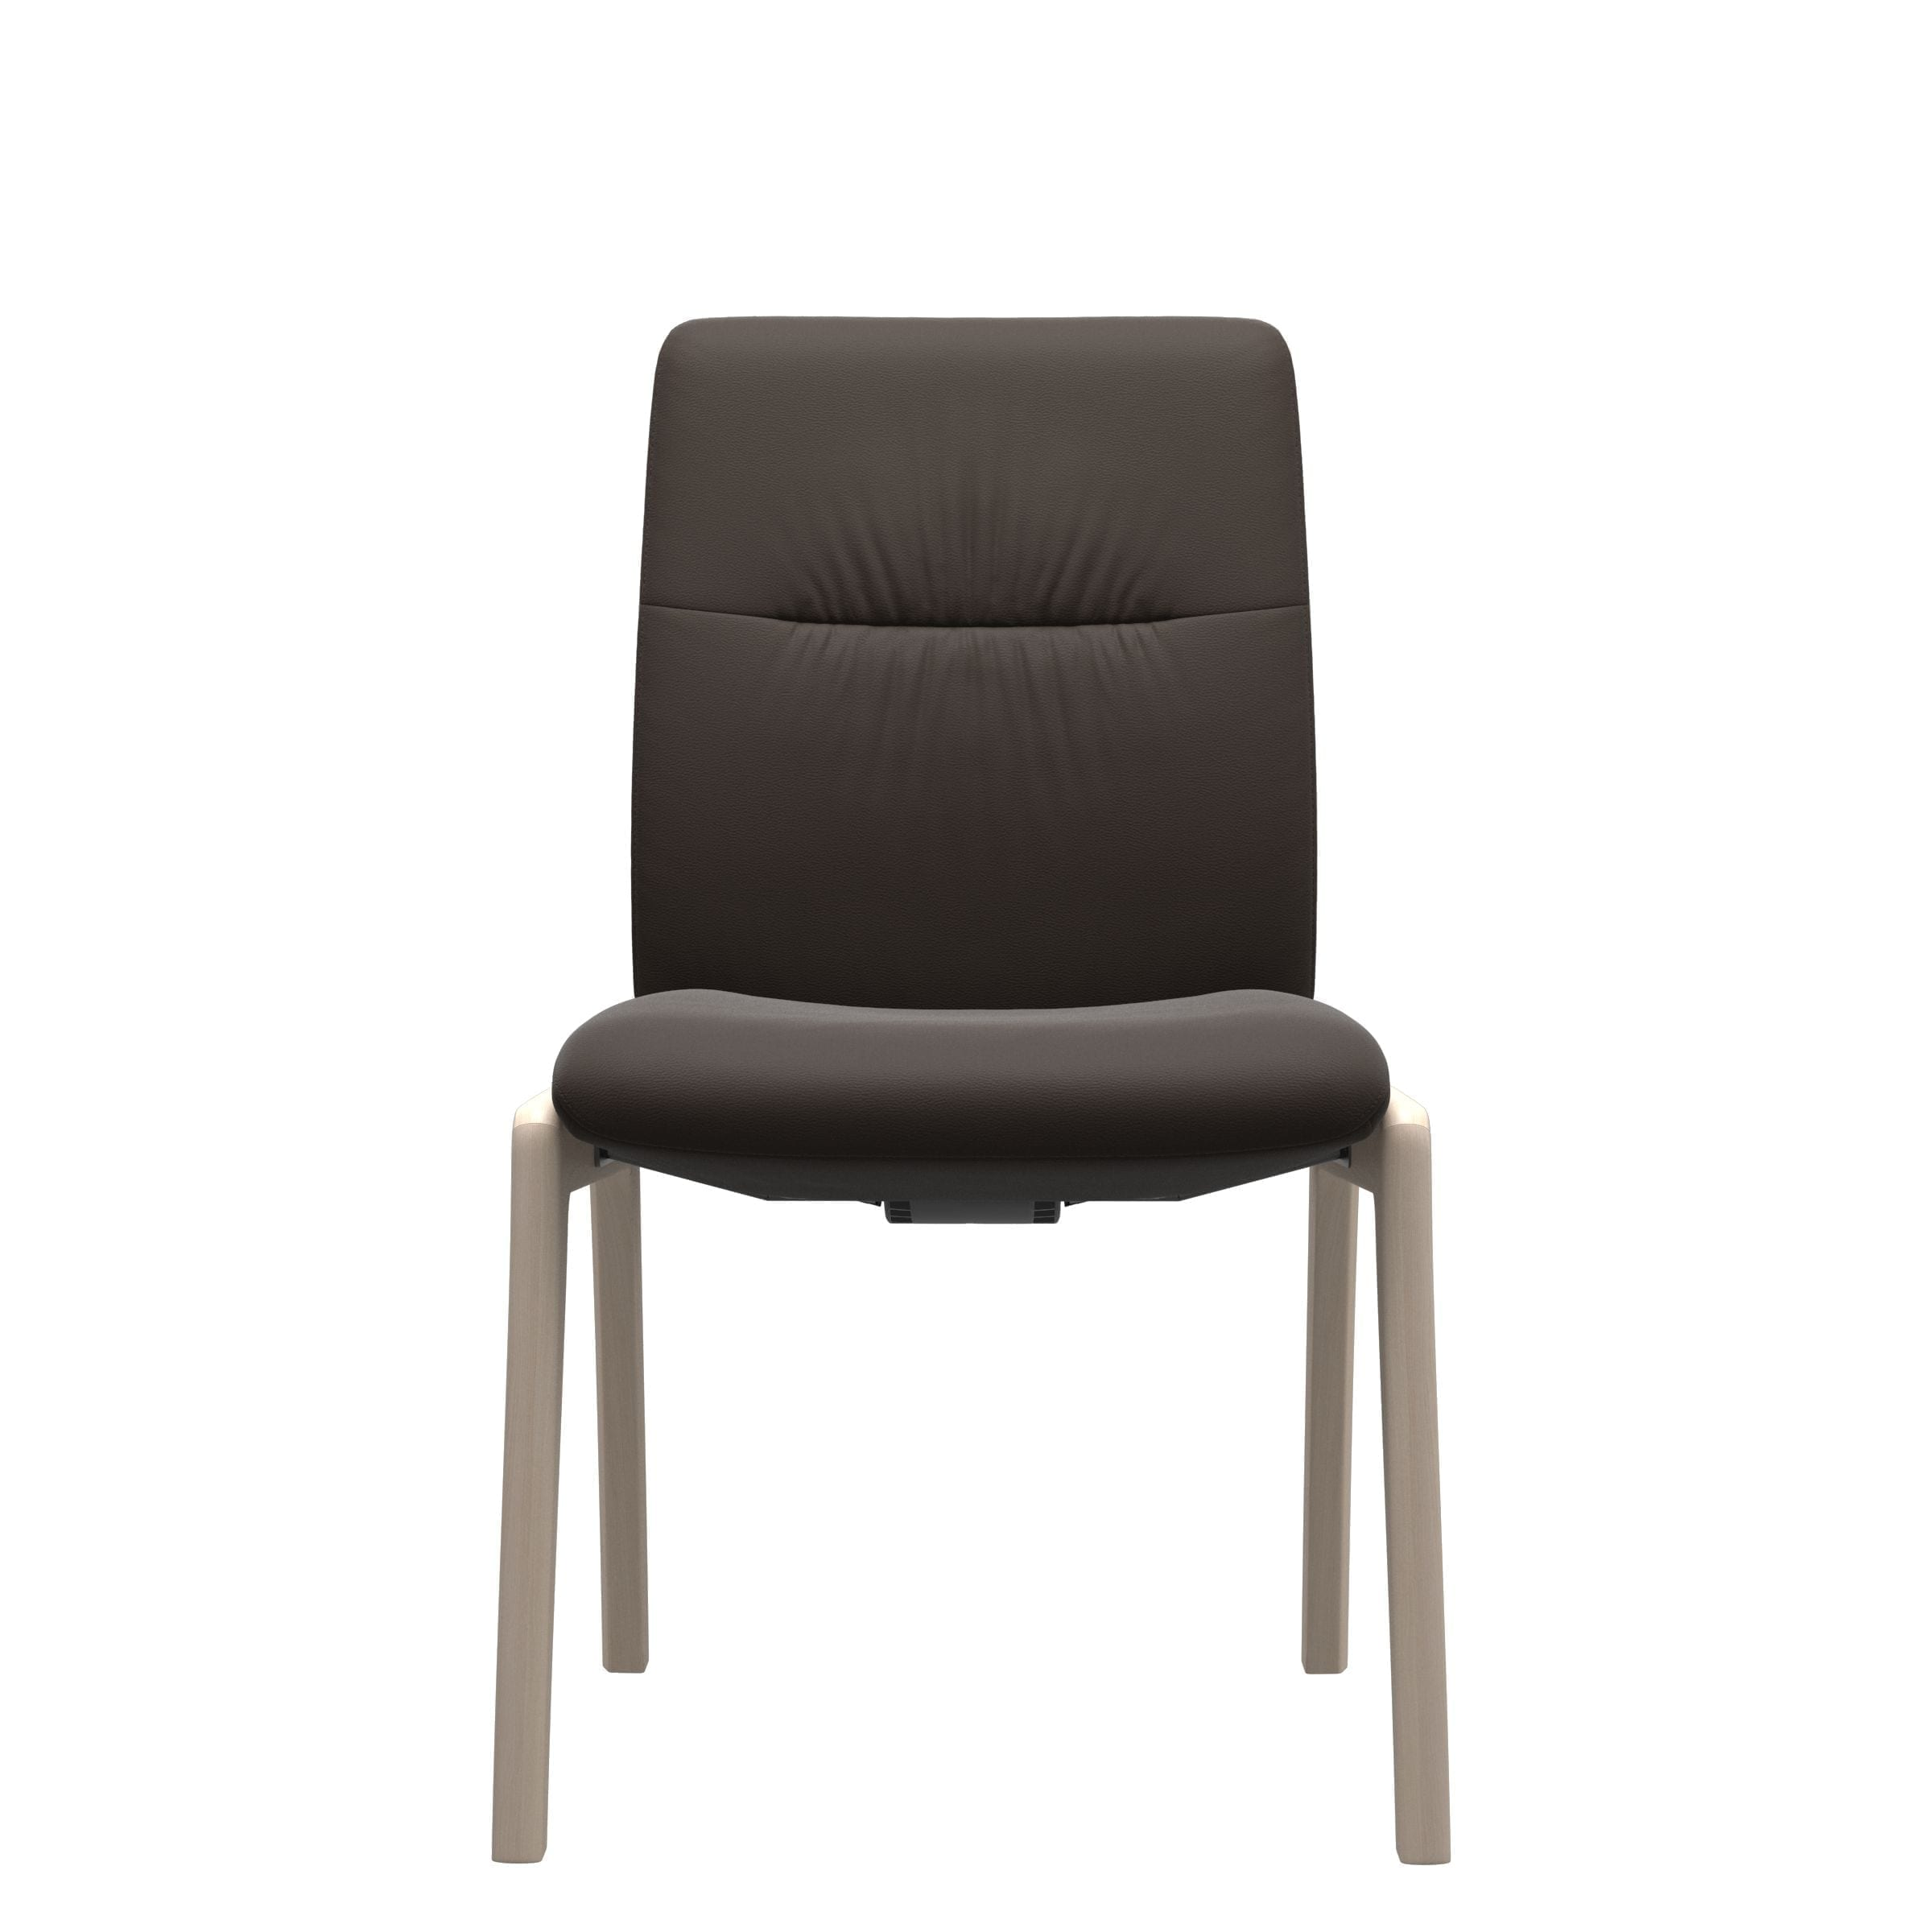 Mint Low Back D100 Chair Stressless